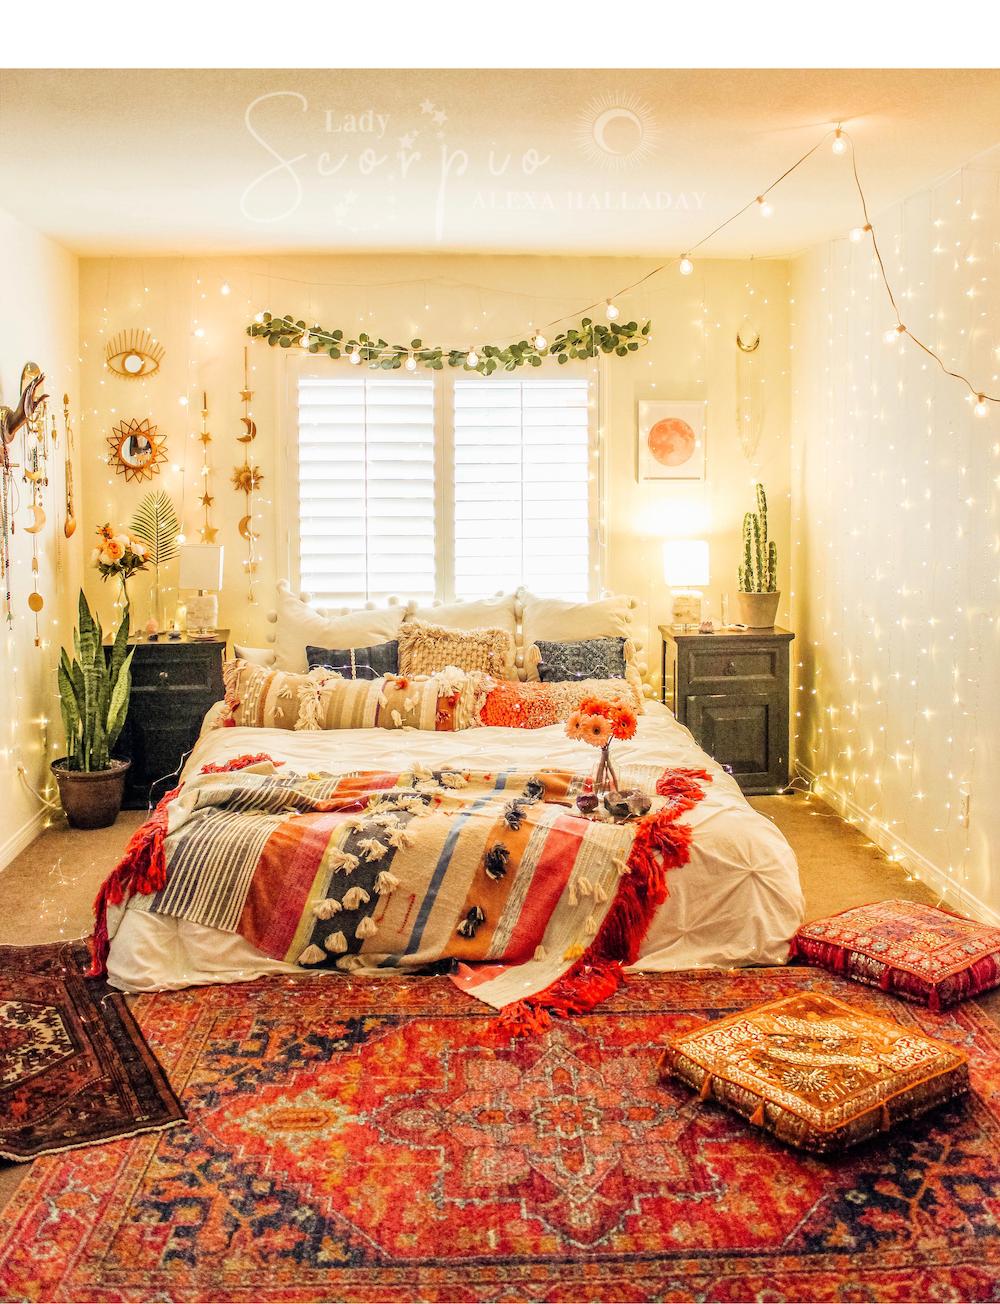 Celestial Wall Hanging Bedroom Inspo